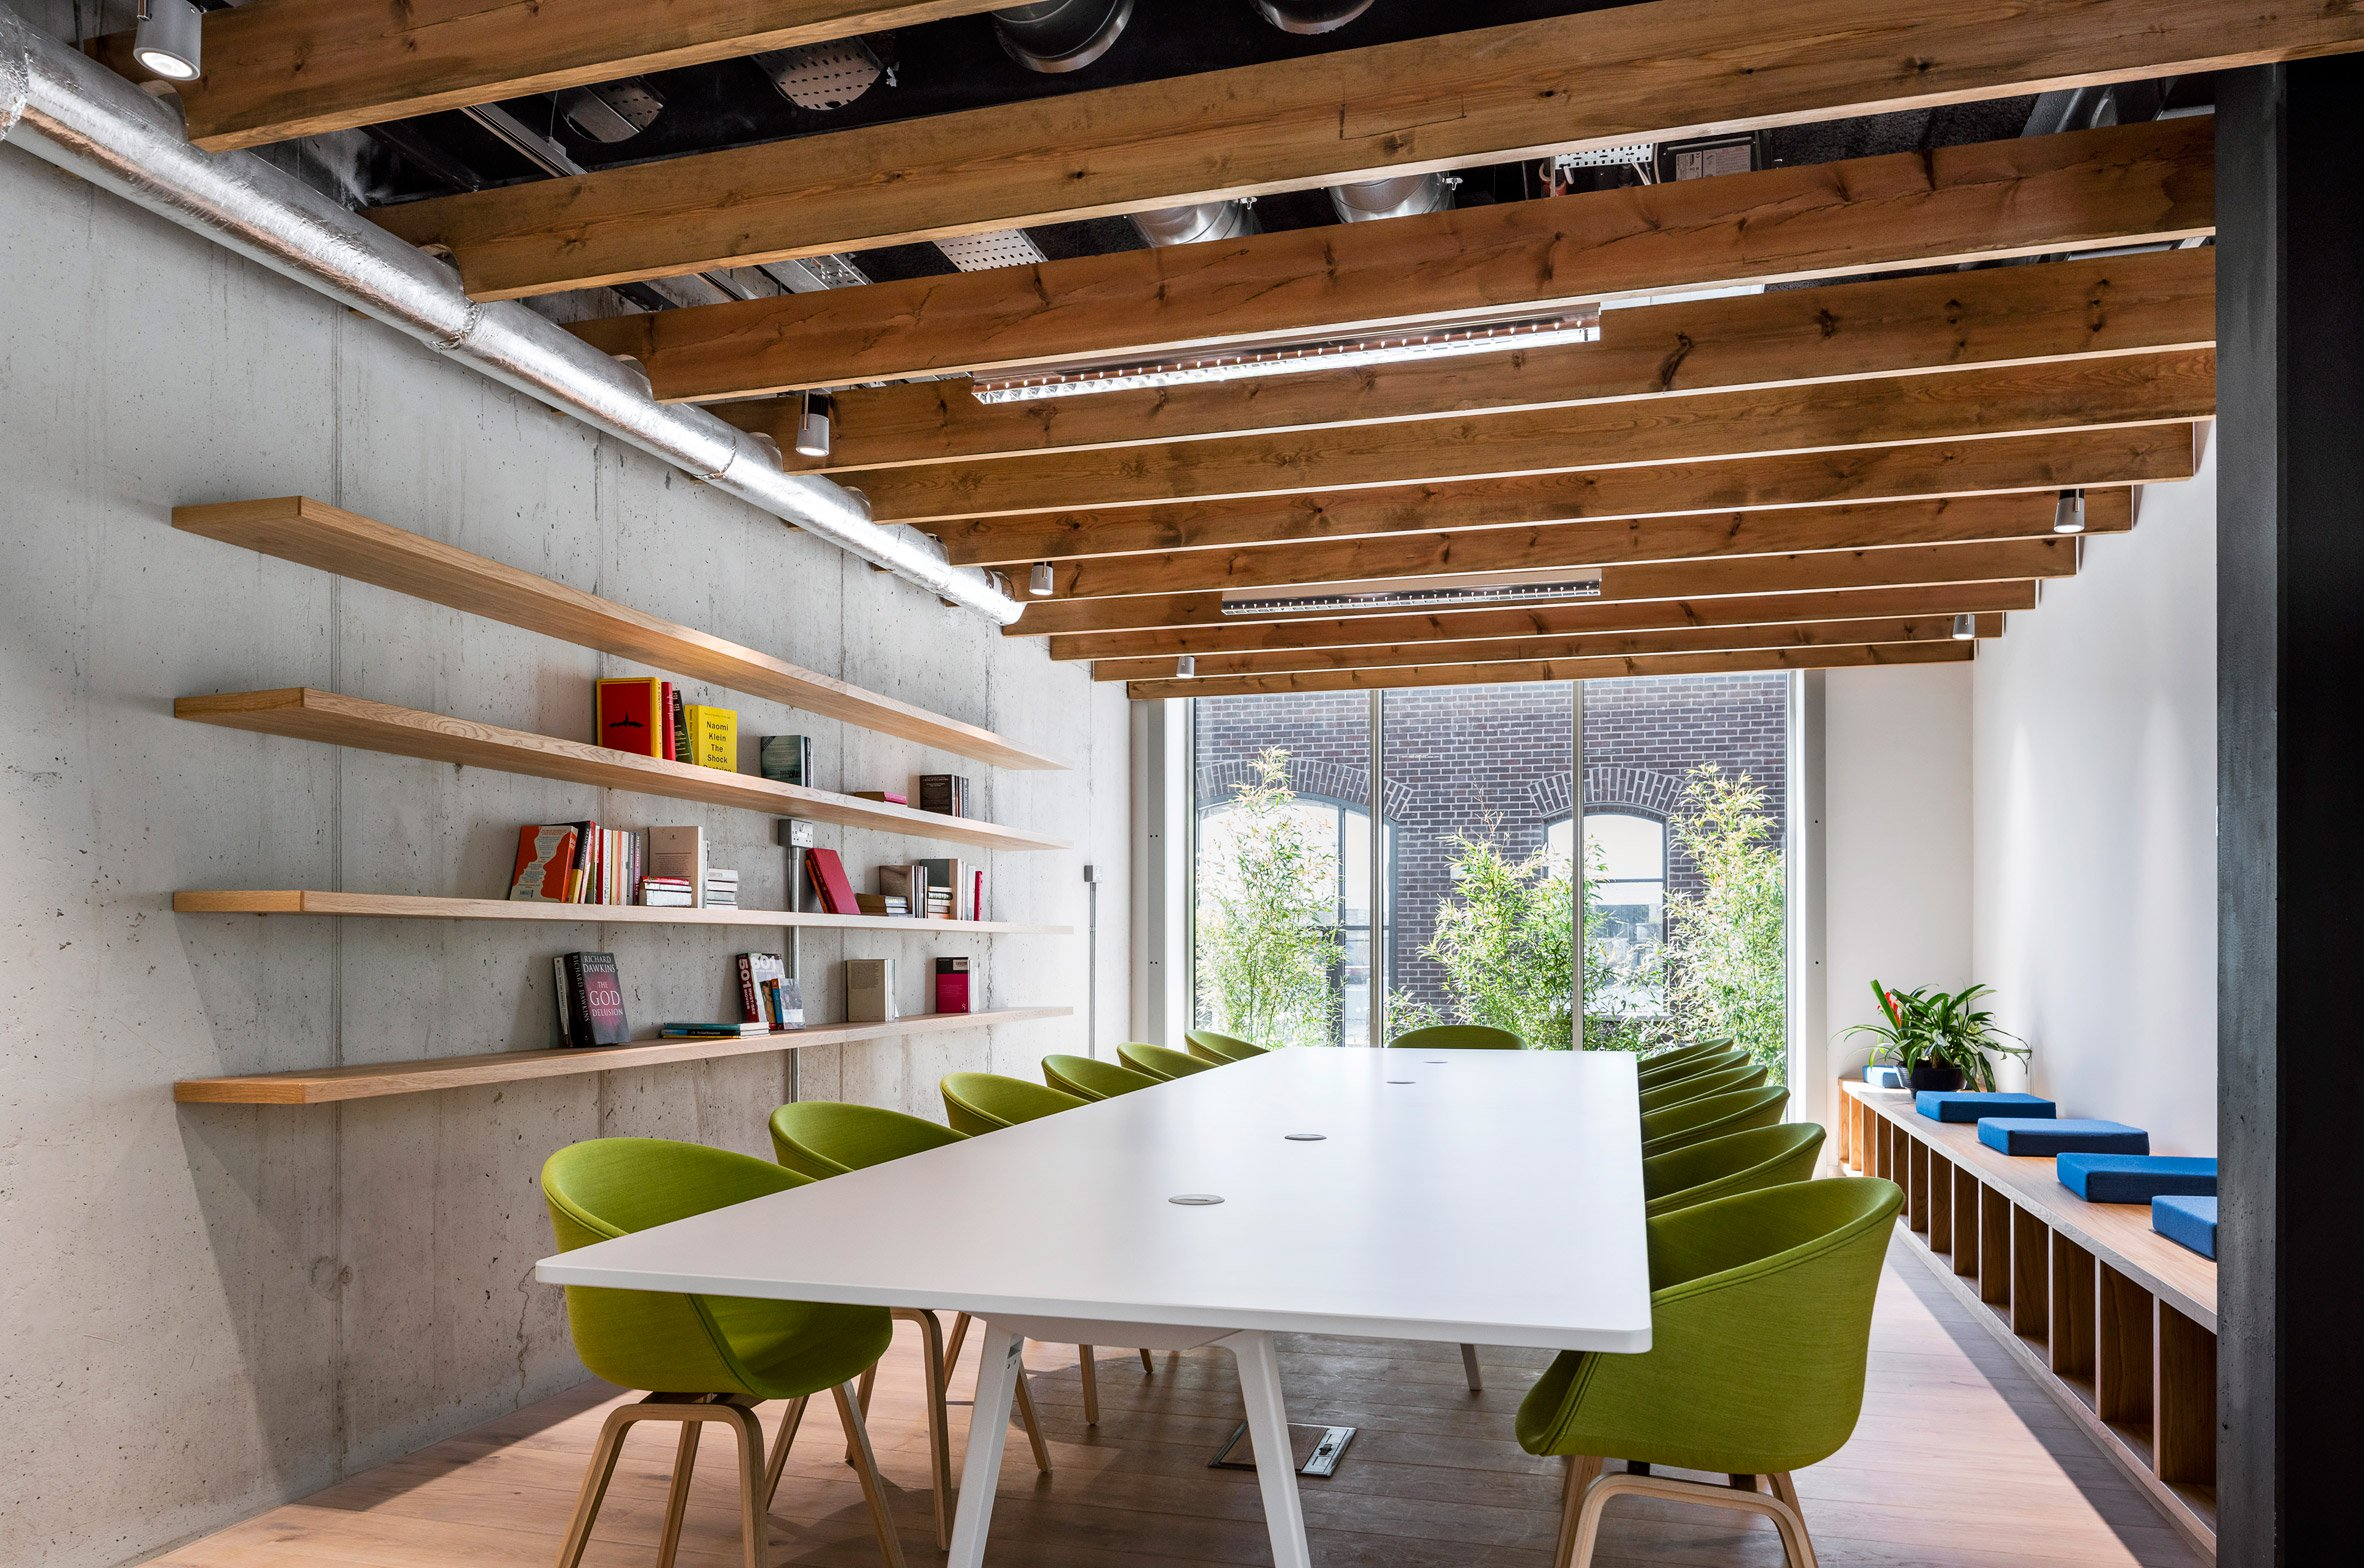 airbnb-dublin-office-interiors-ireland-offices_dezeen_2364_col_25